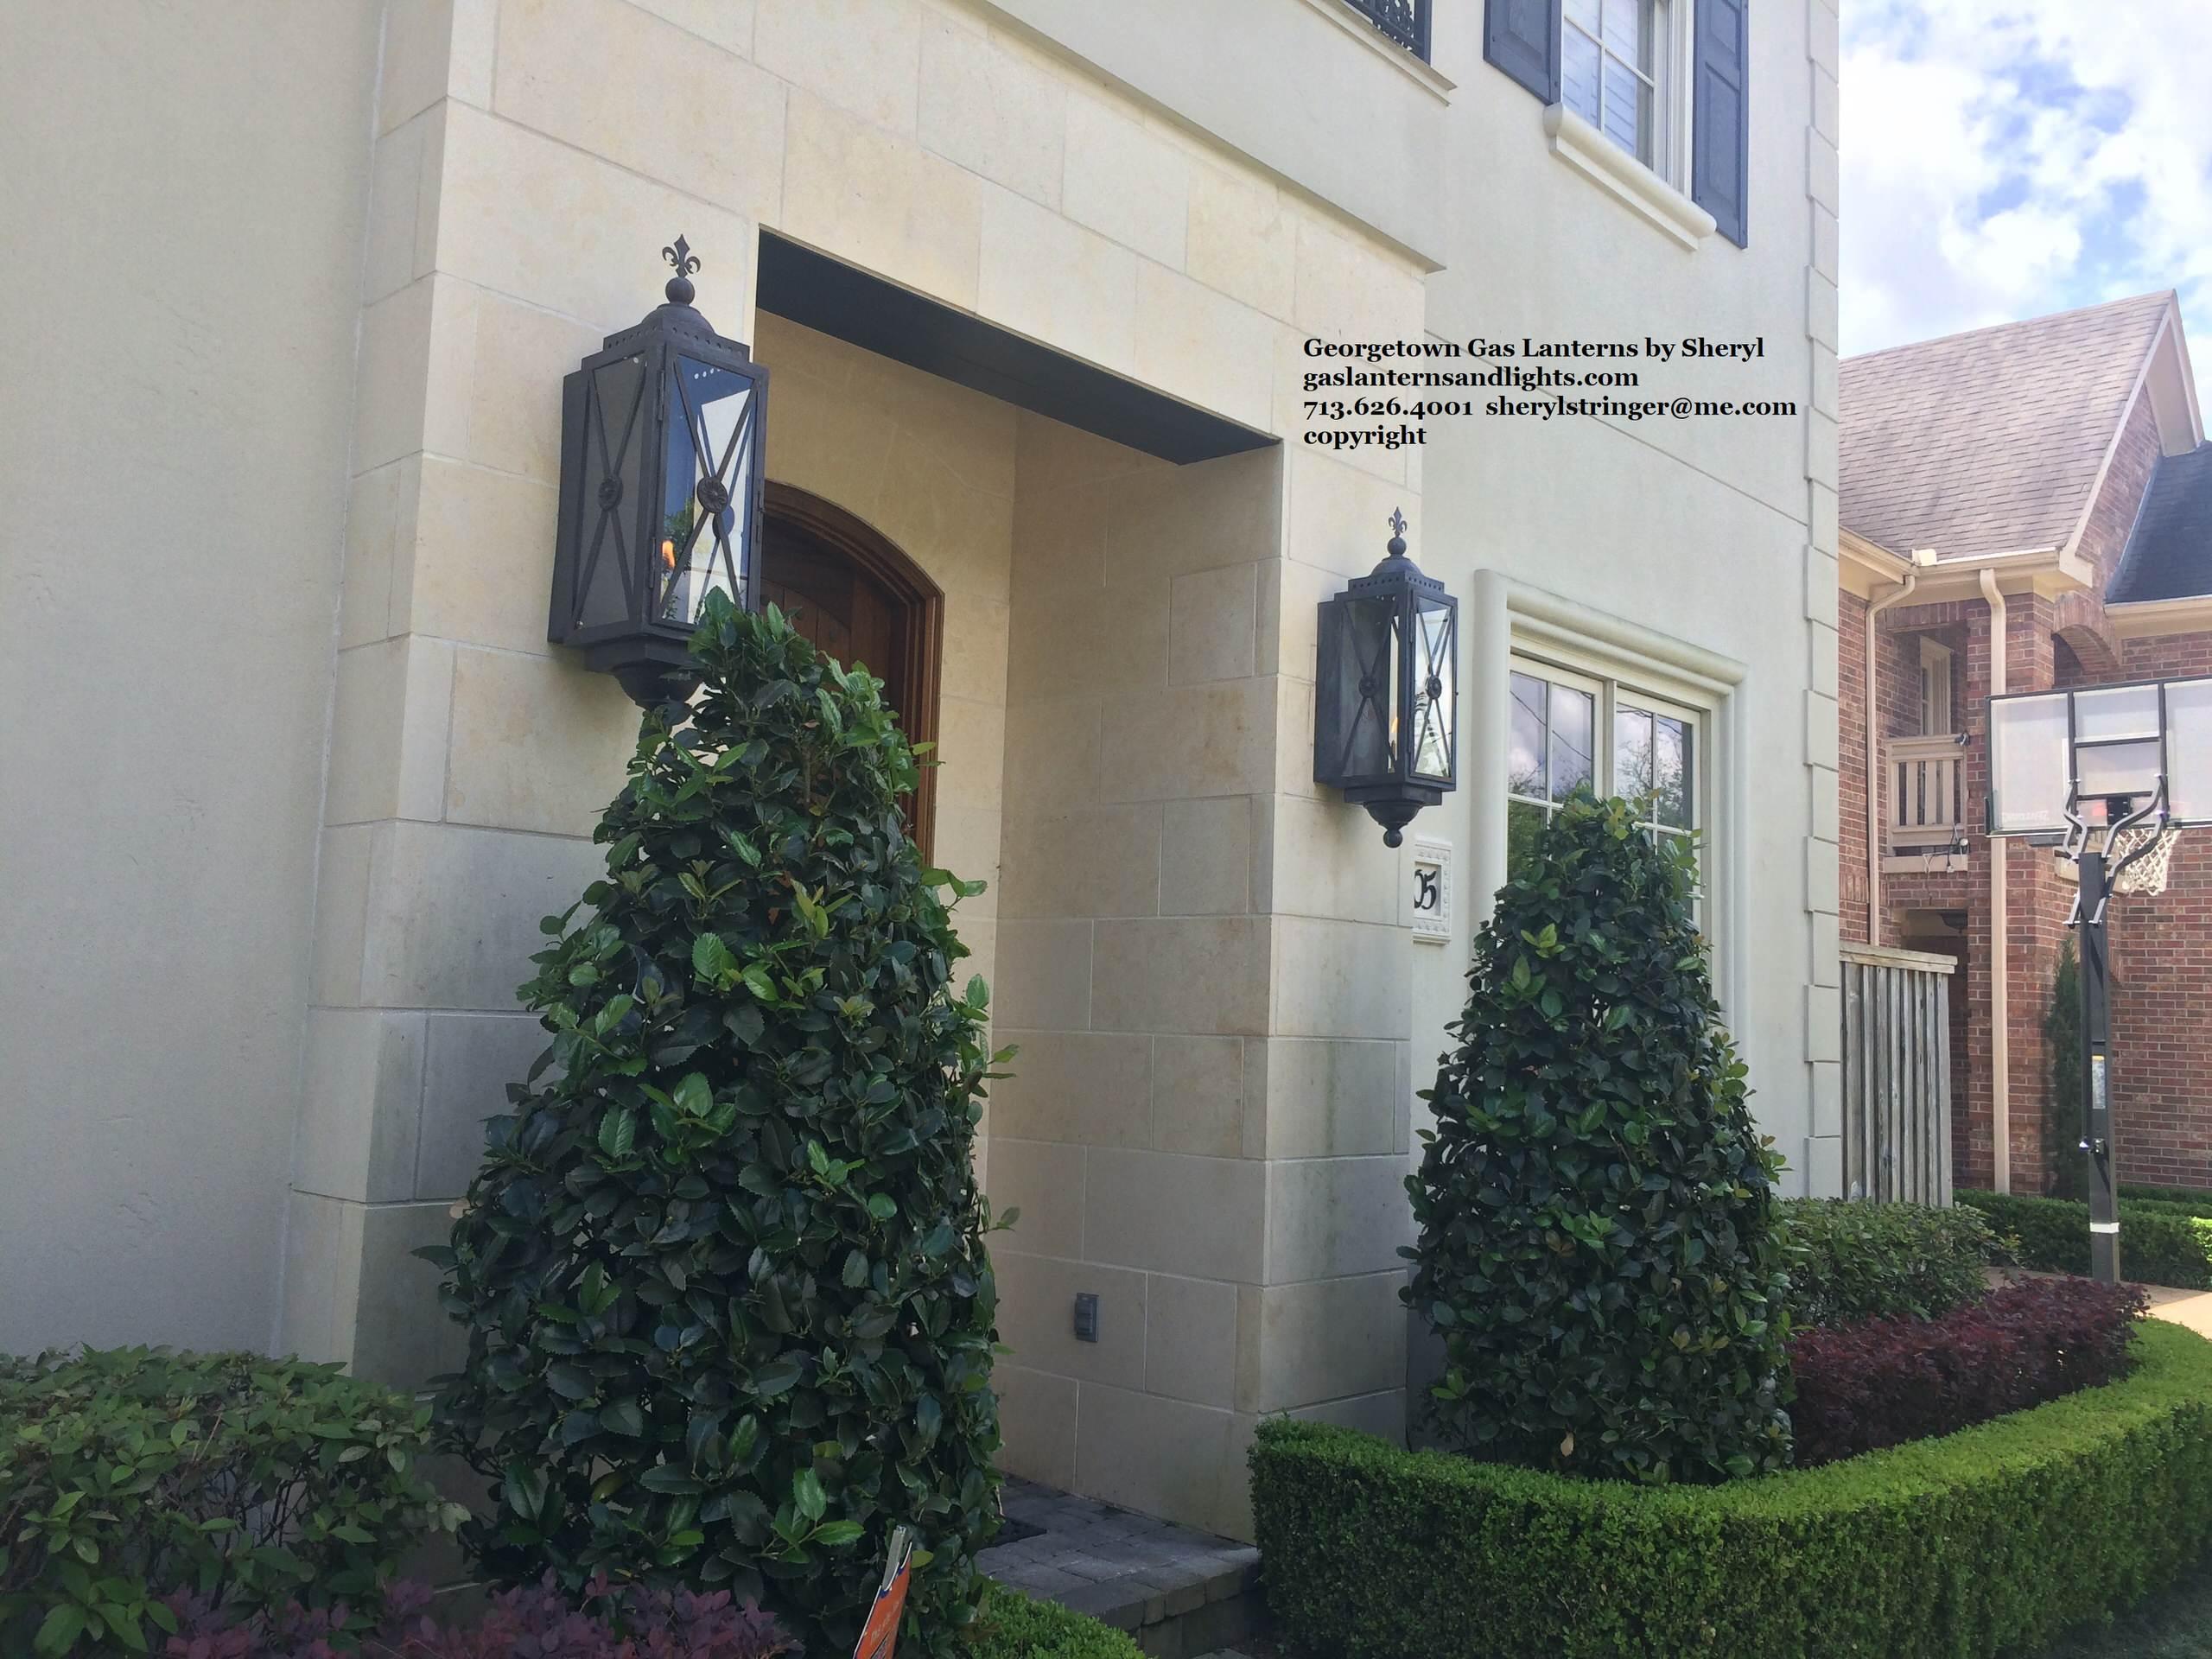 Sheryl's Georgetown Gas Lantern